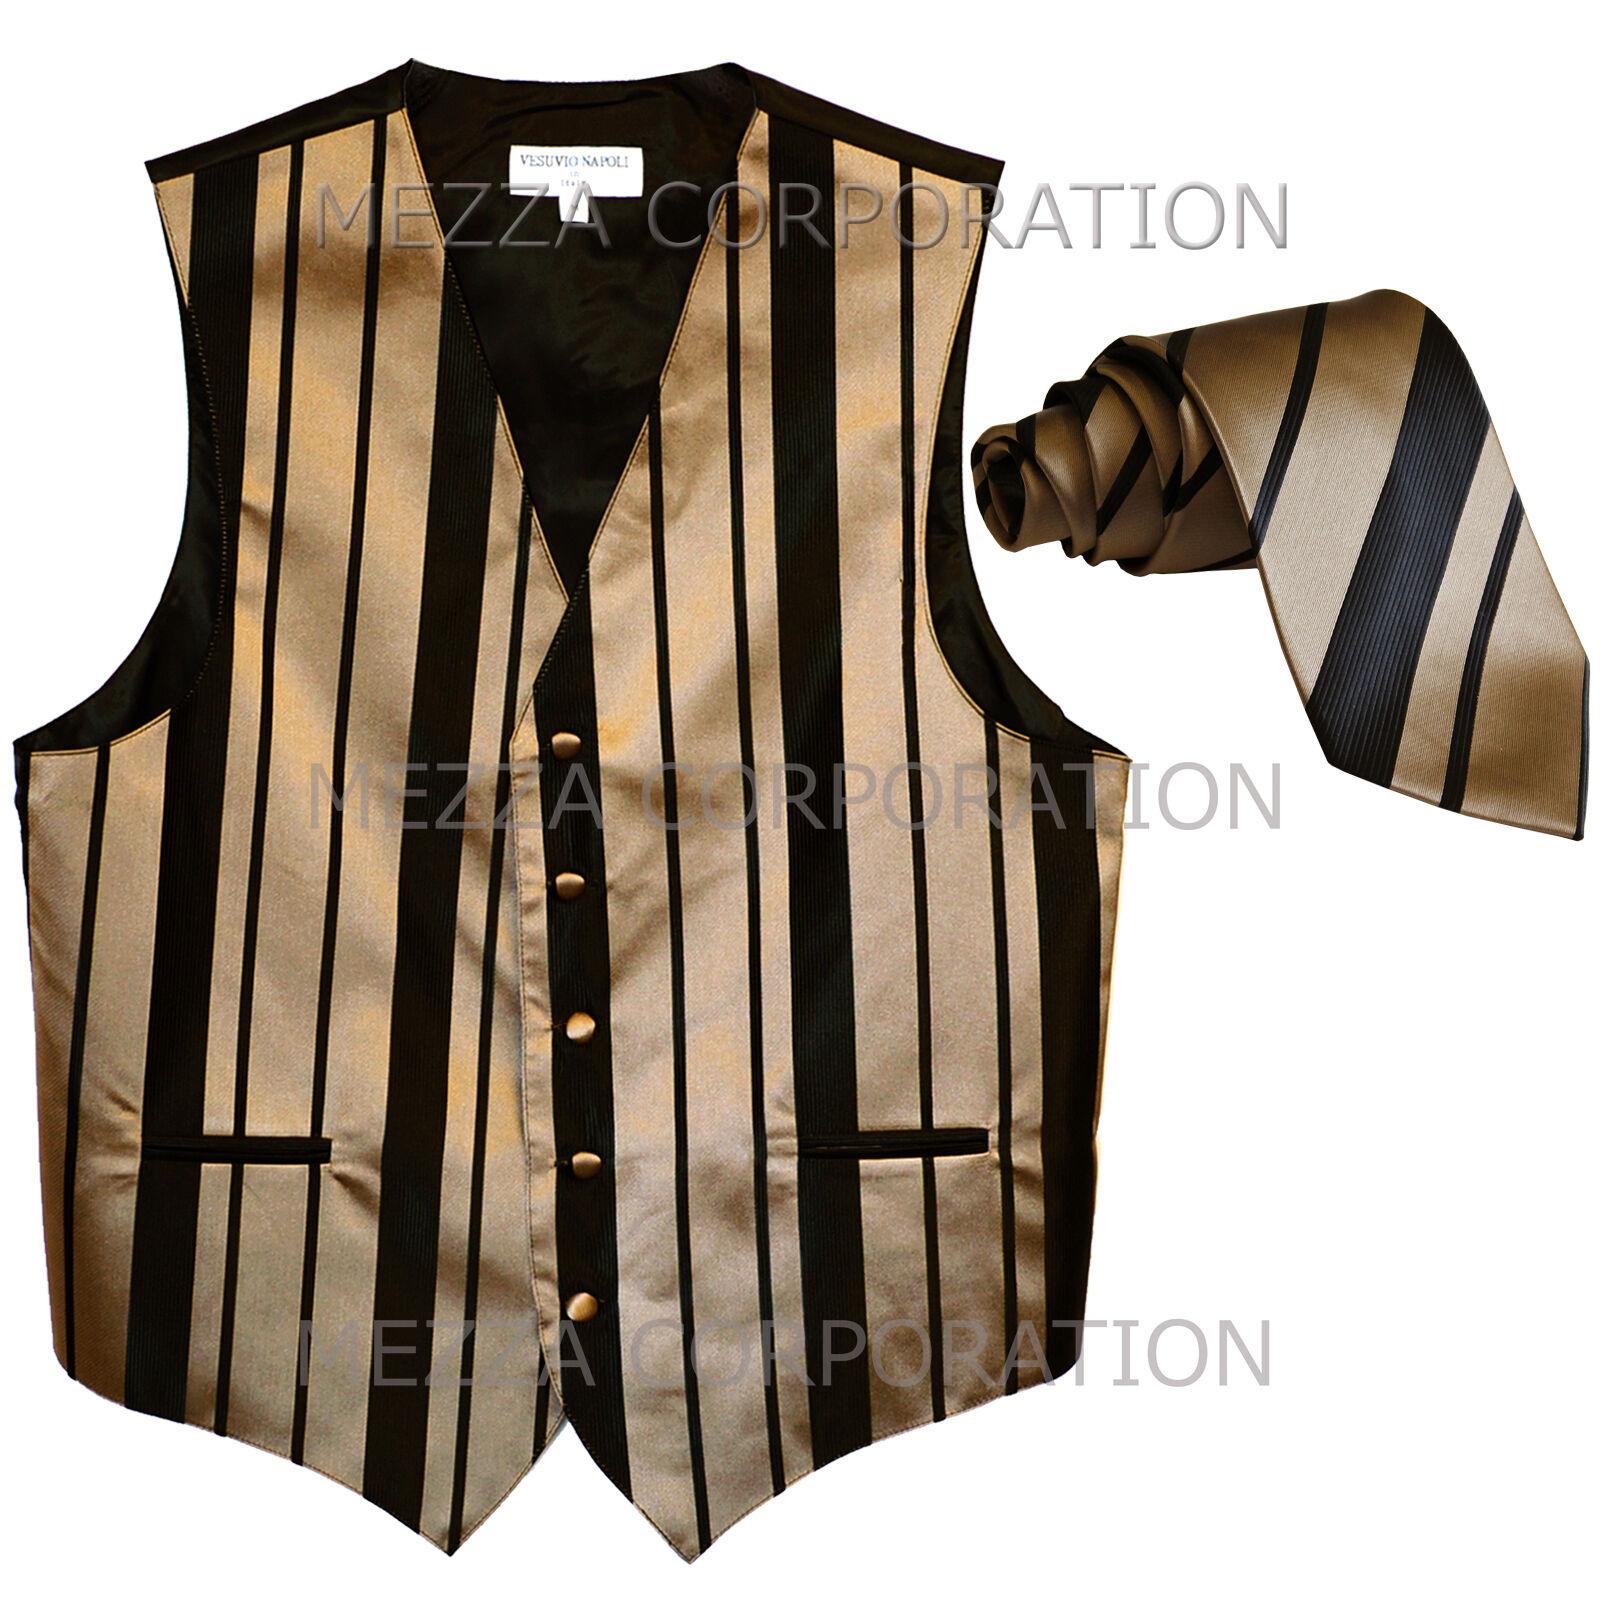 New Men's Tuxedo Vest Waistcoat Stripes Necktie prom wedding party Black Mocca